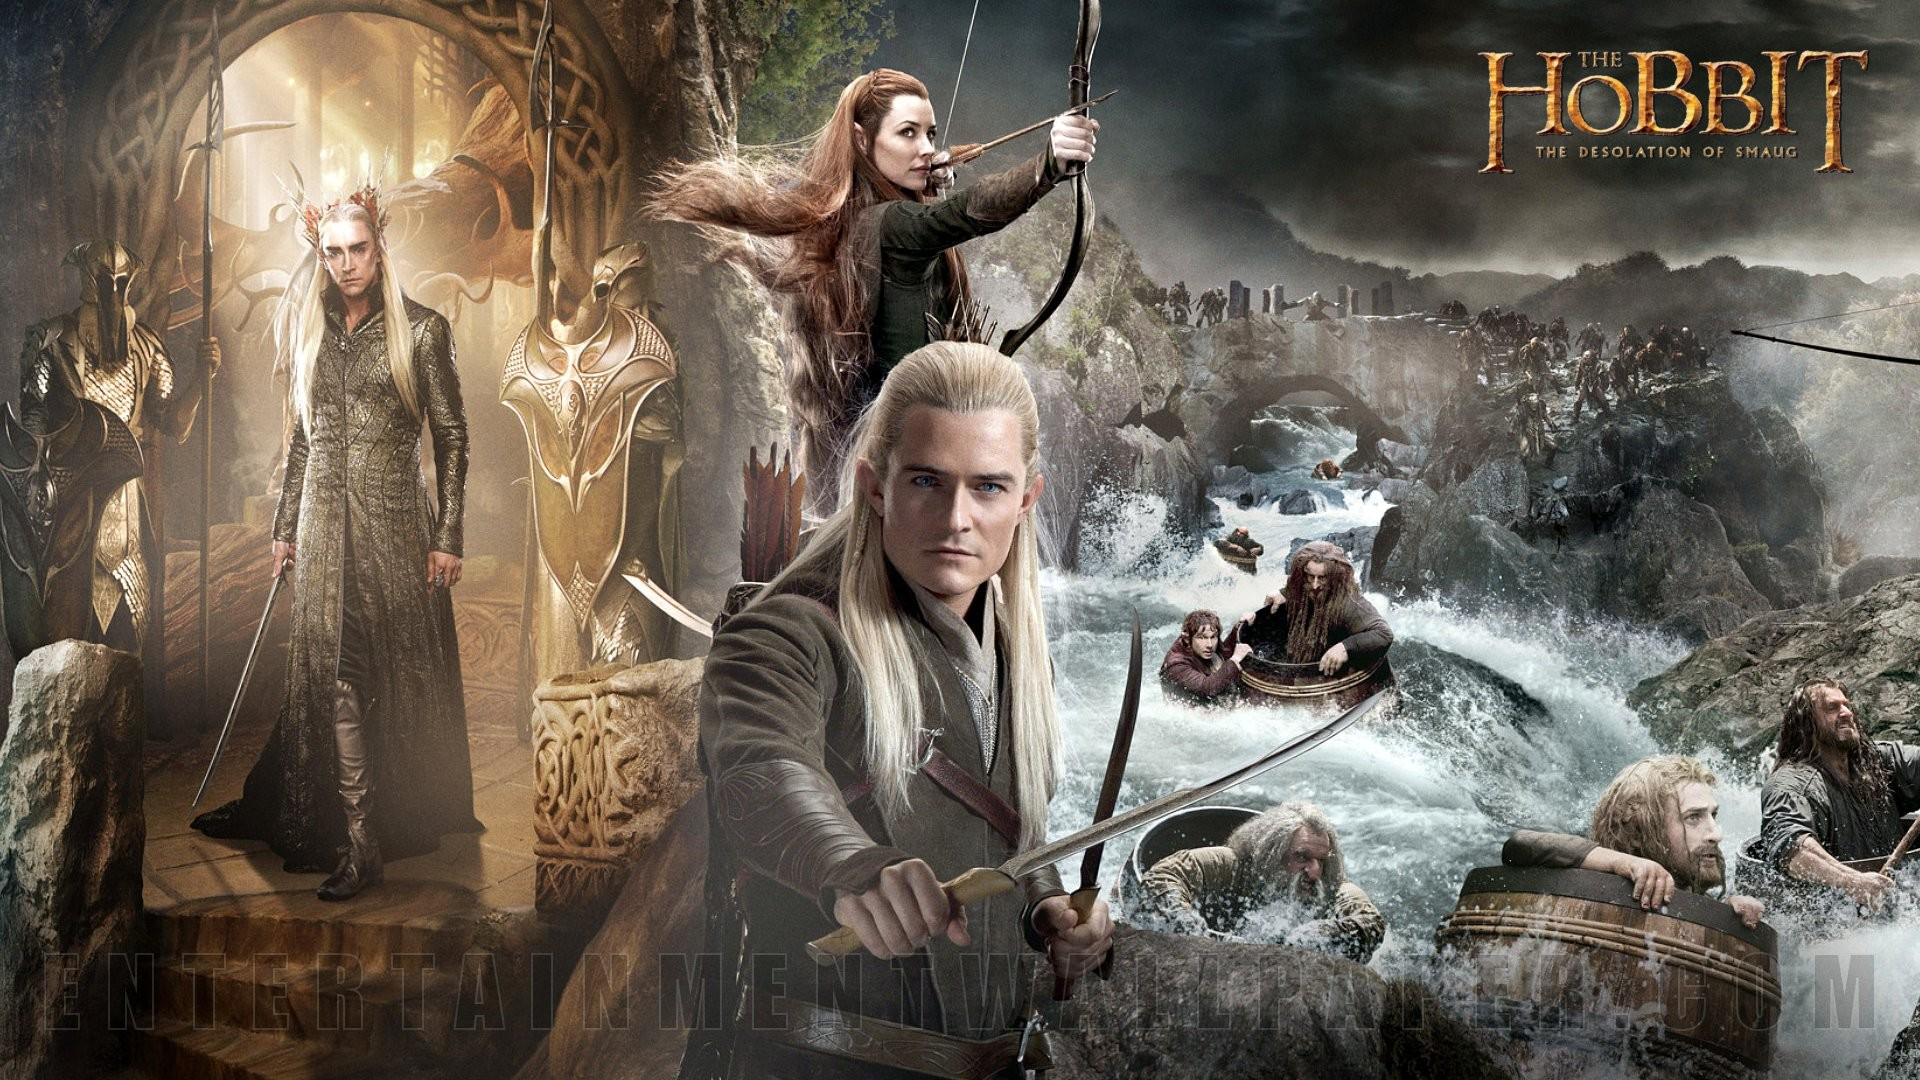 Hobbit Desolation Of Smaug Wallpapers (6 Wallpapers)